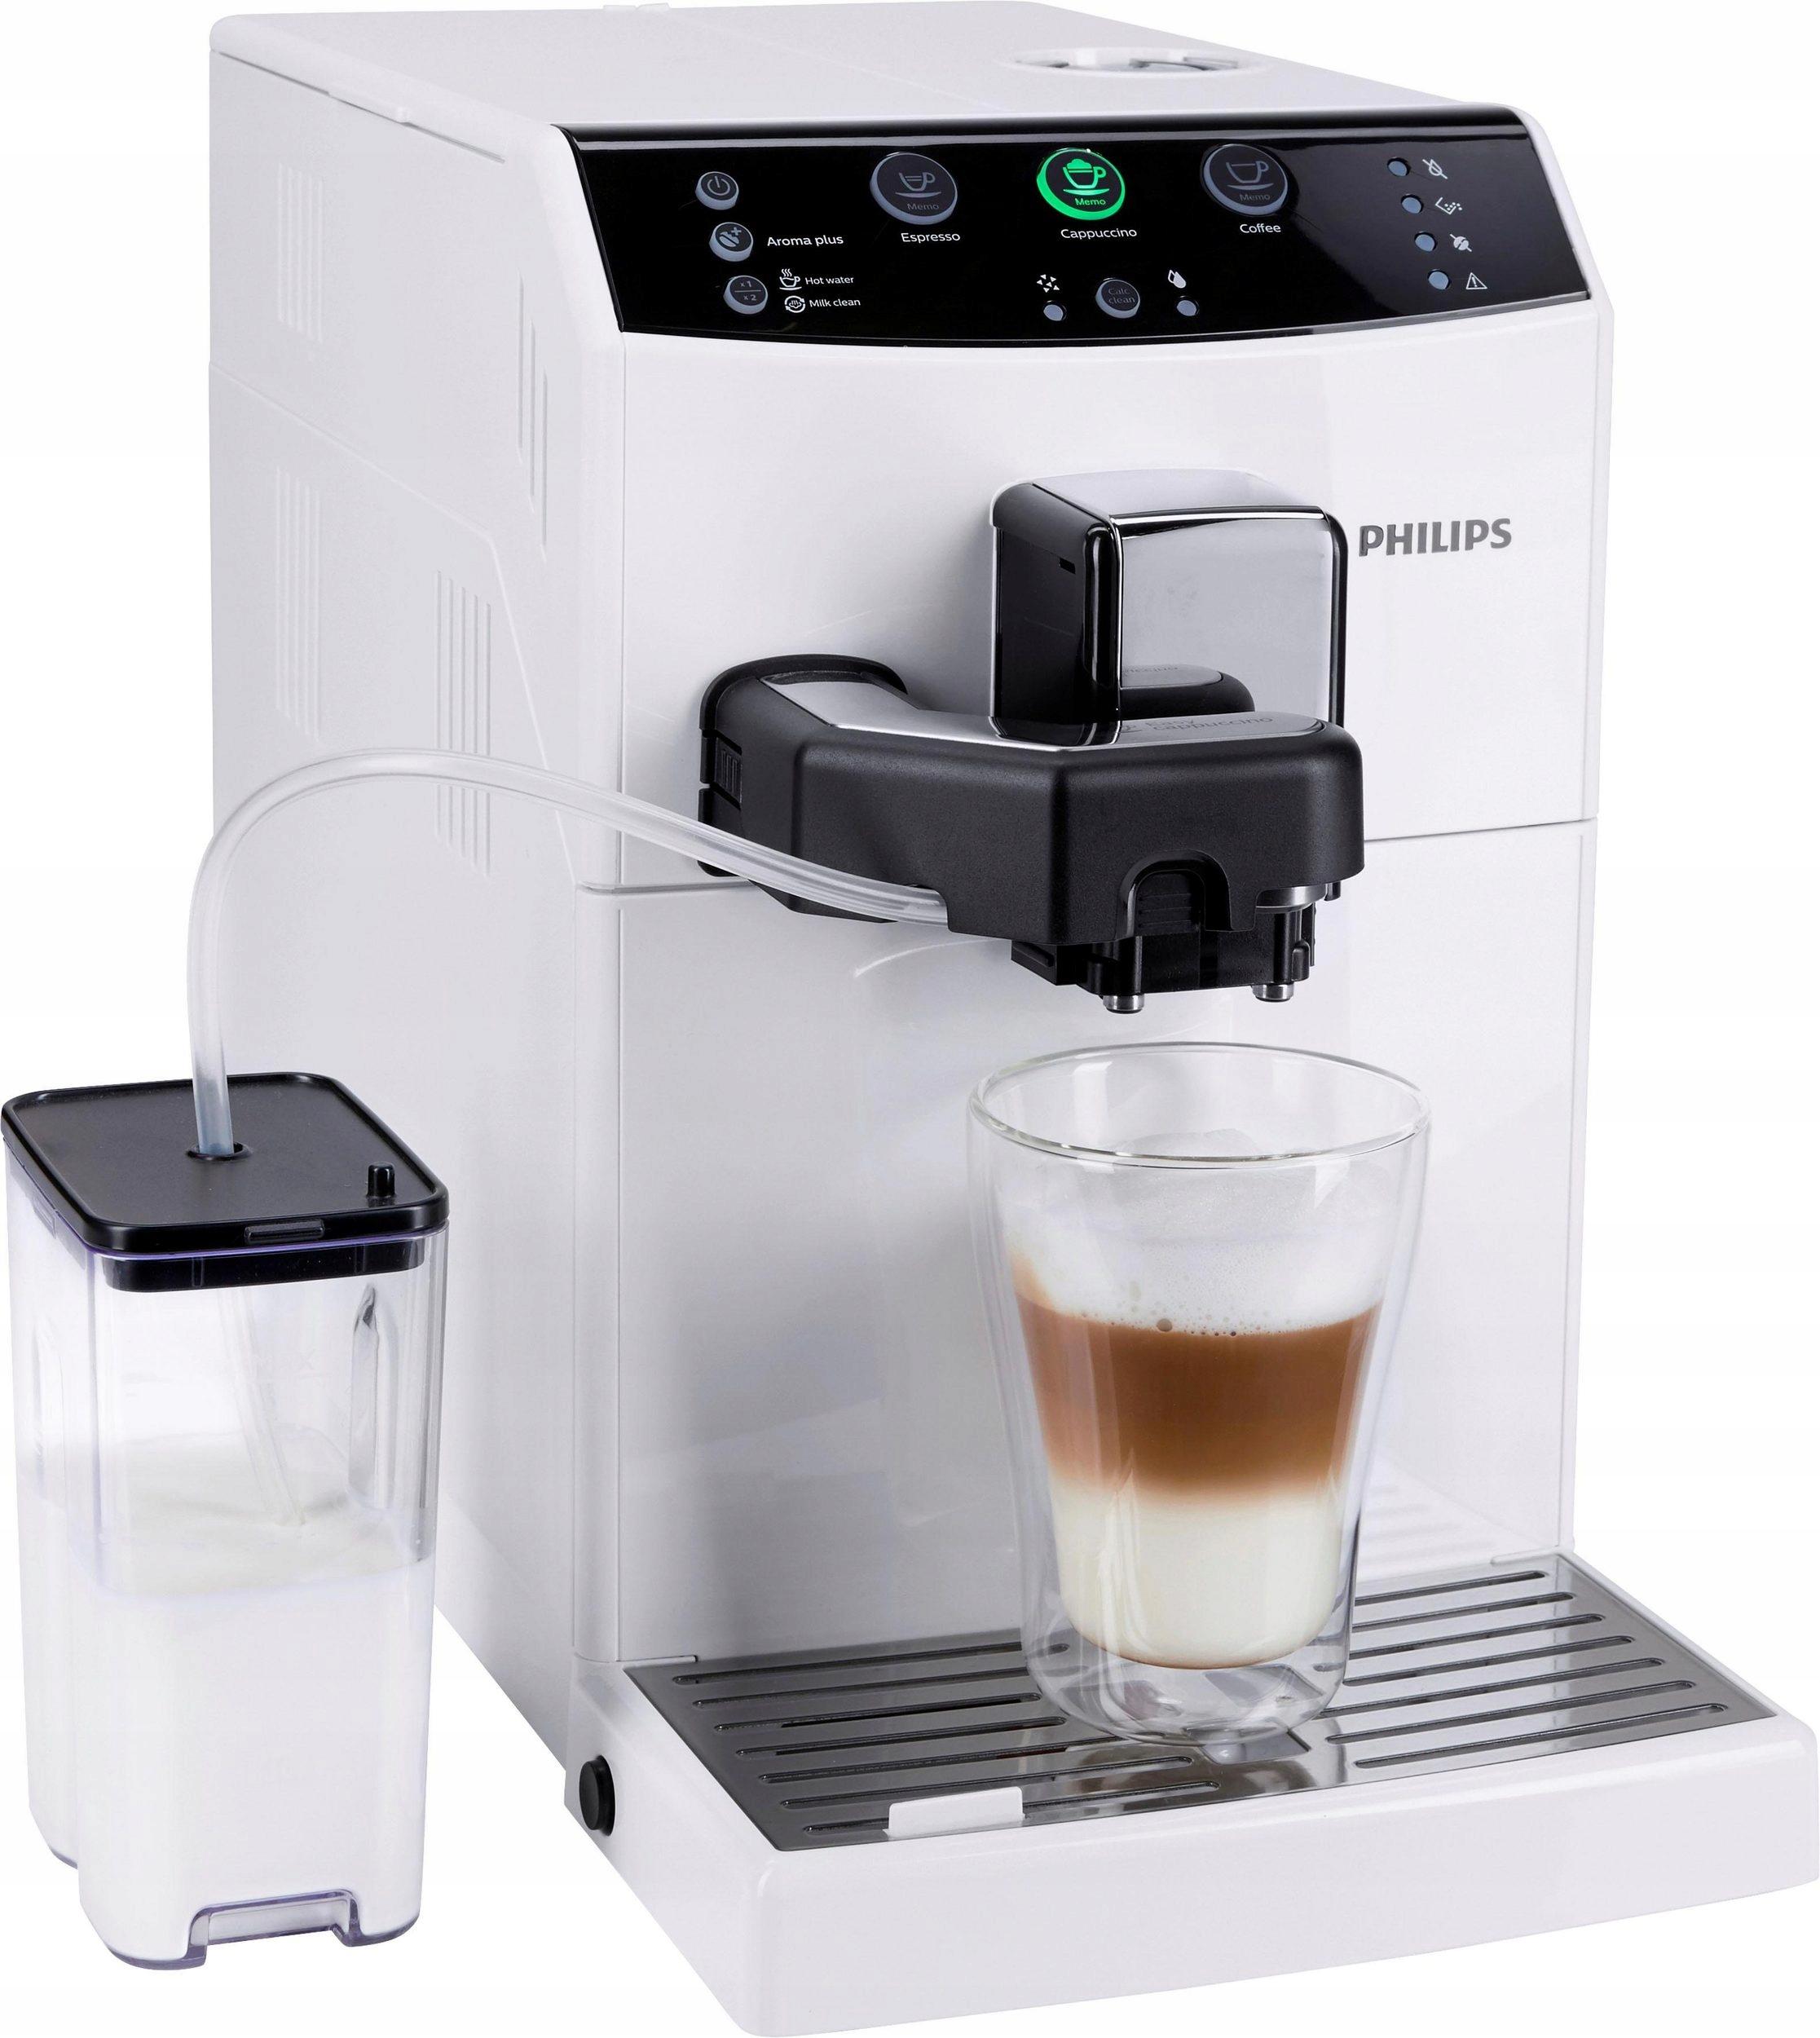 Philips 3000 Serie HD8830 Ekspres do kawy EASYCAPU